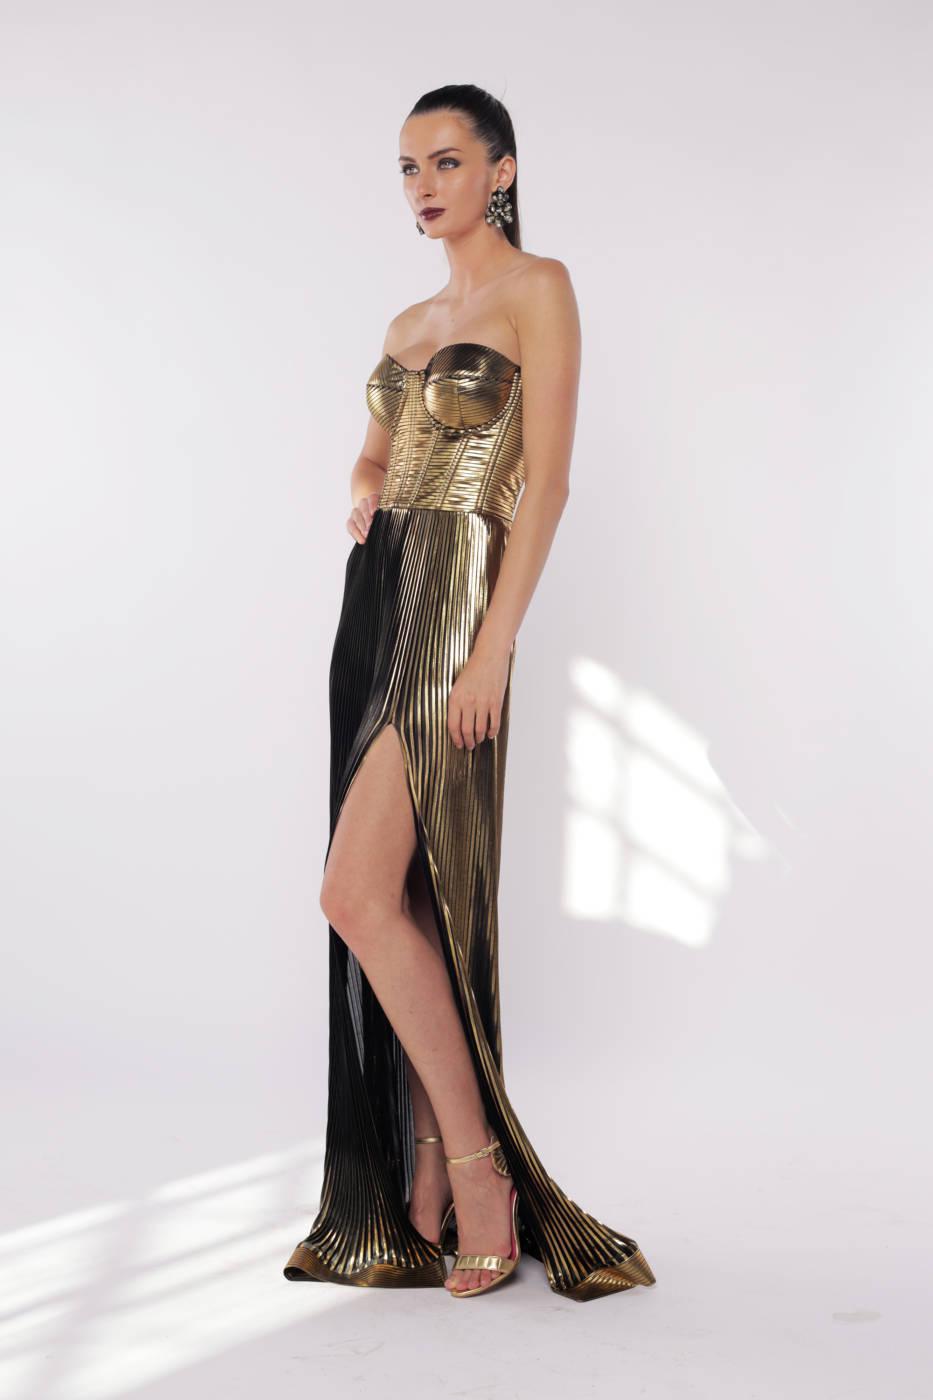 Rochie plisata cu corset lunga, 1000,00 RON, Silk Love & Lace